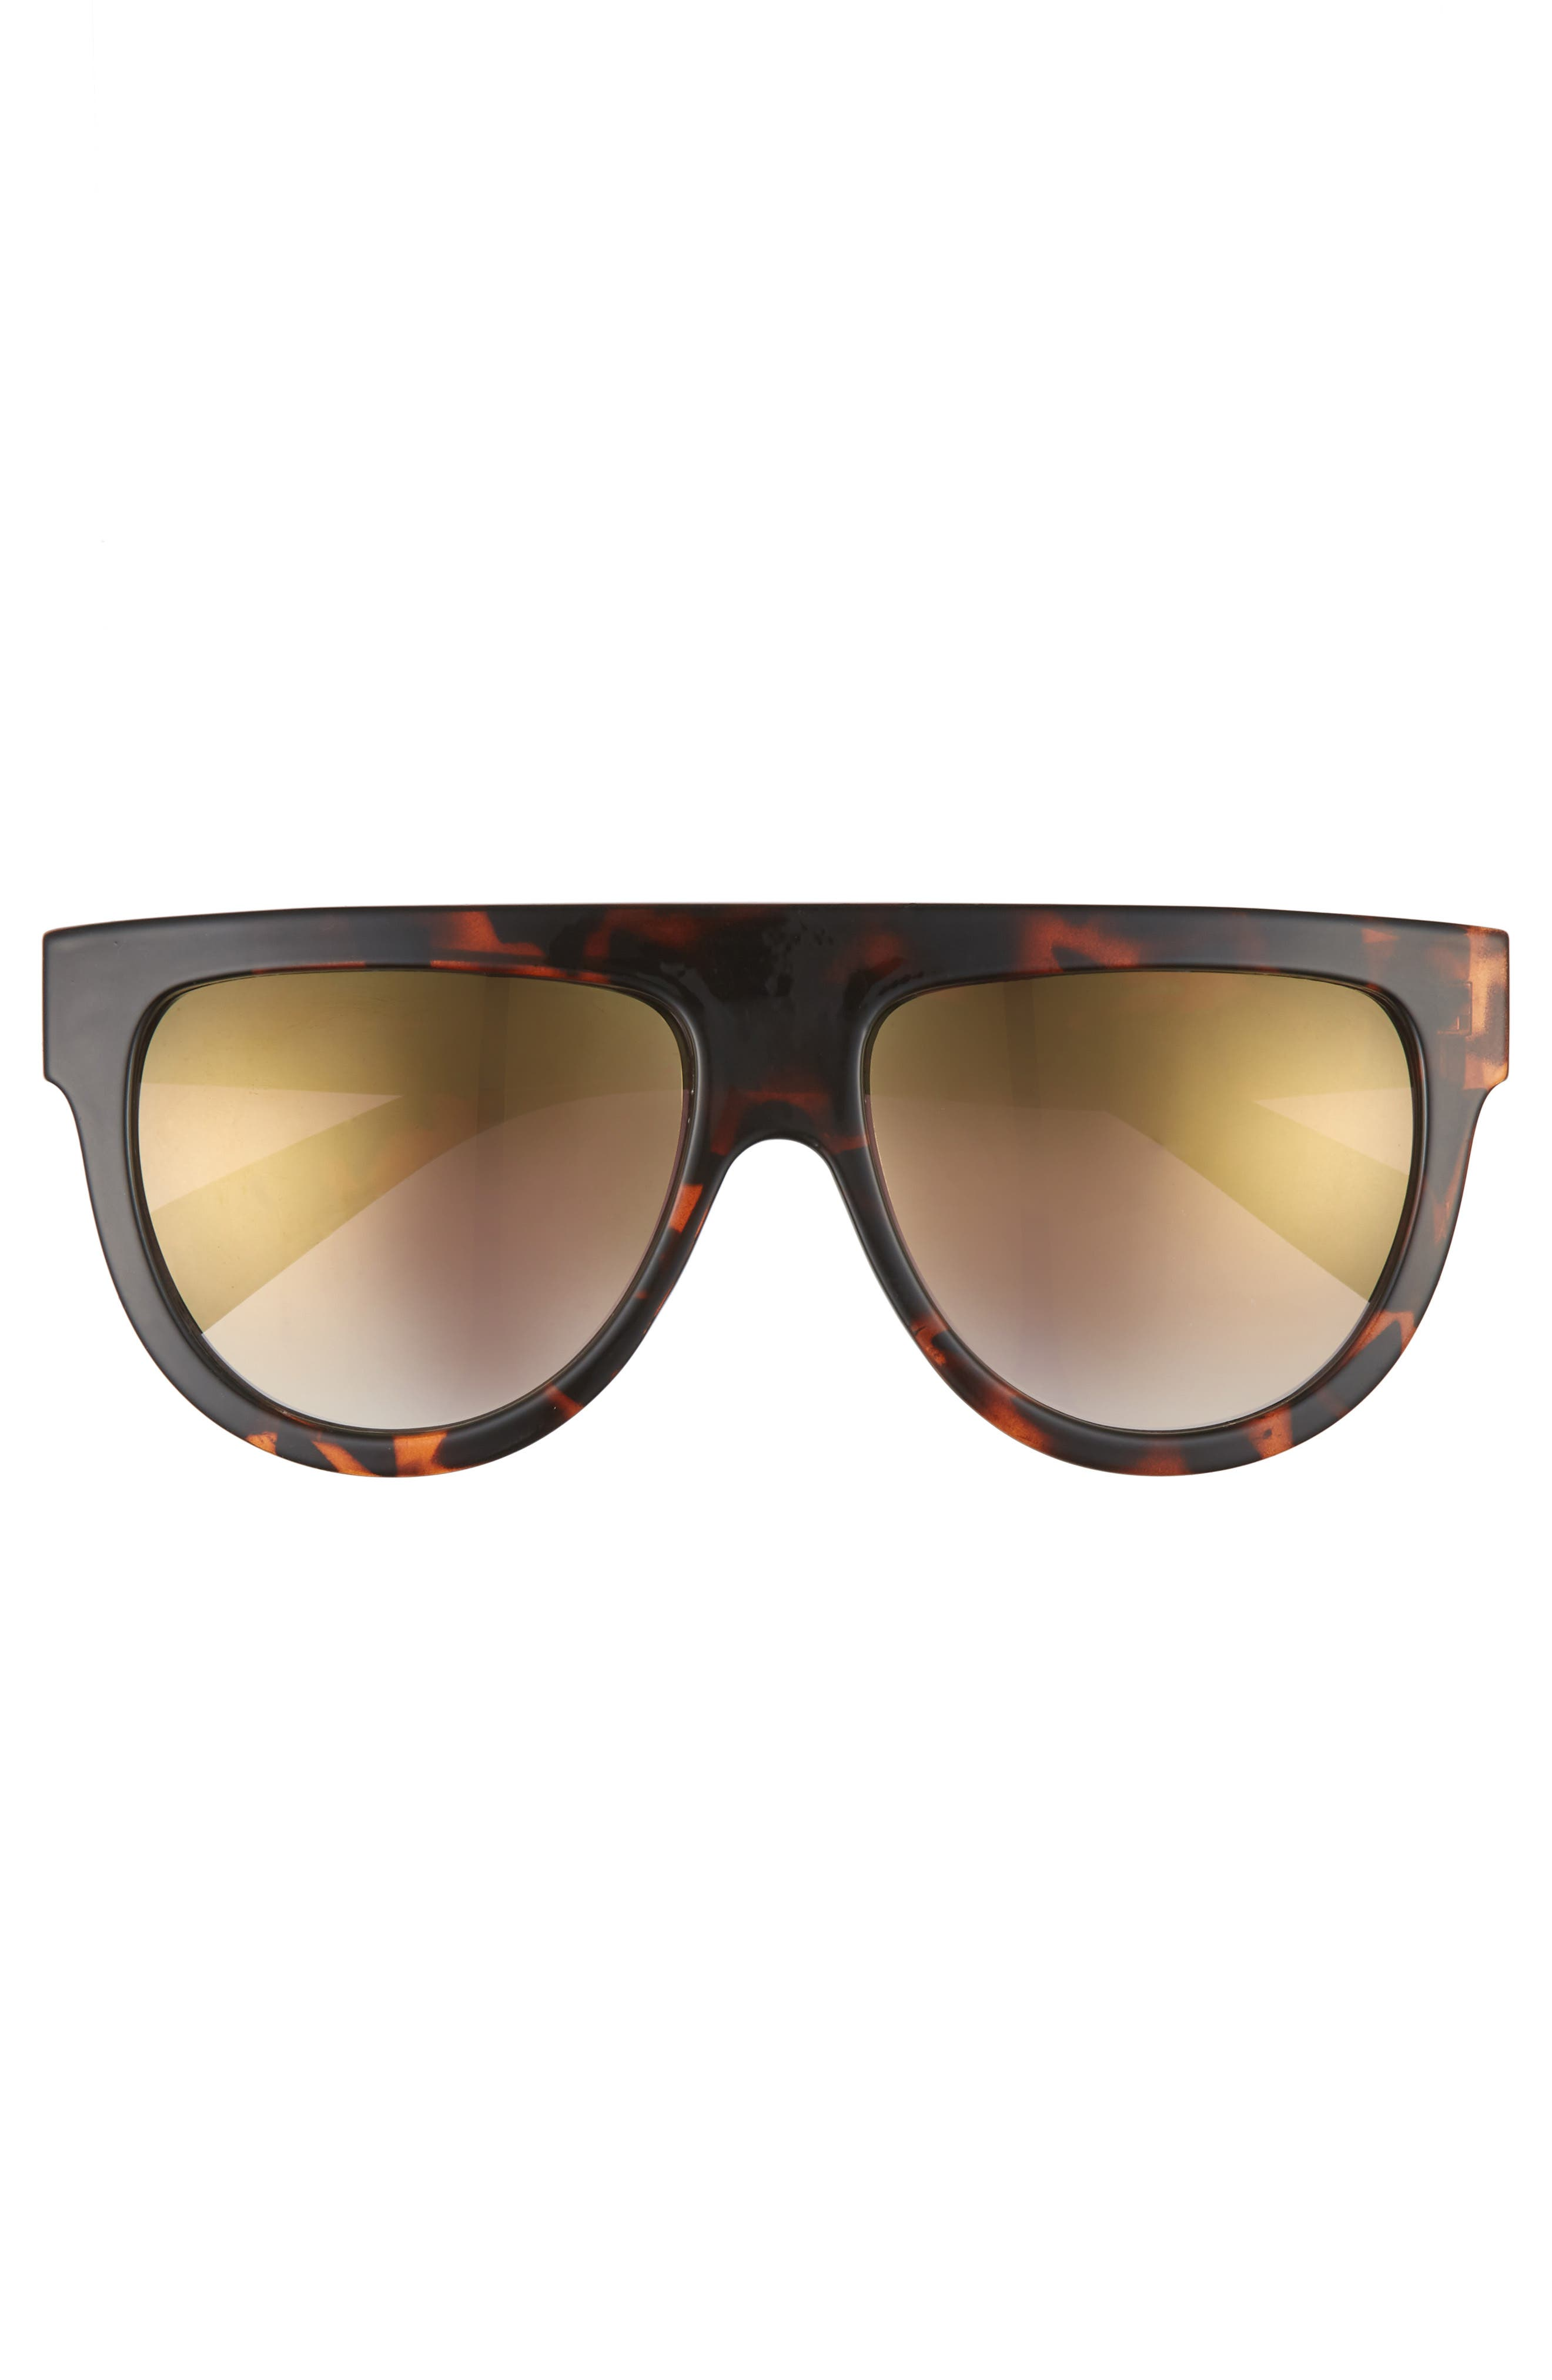 68mm Flat Top Sunglasses,                             Alternate thumbnail 5, color,